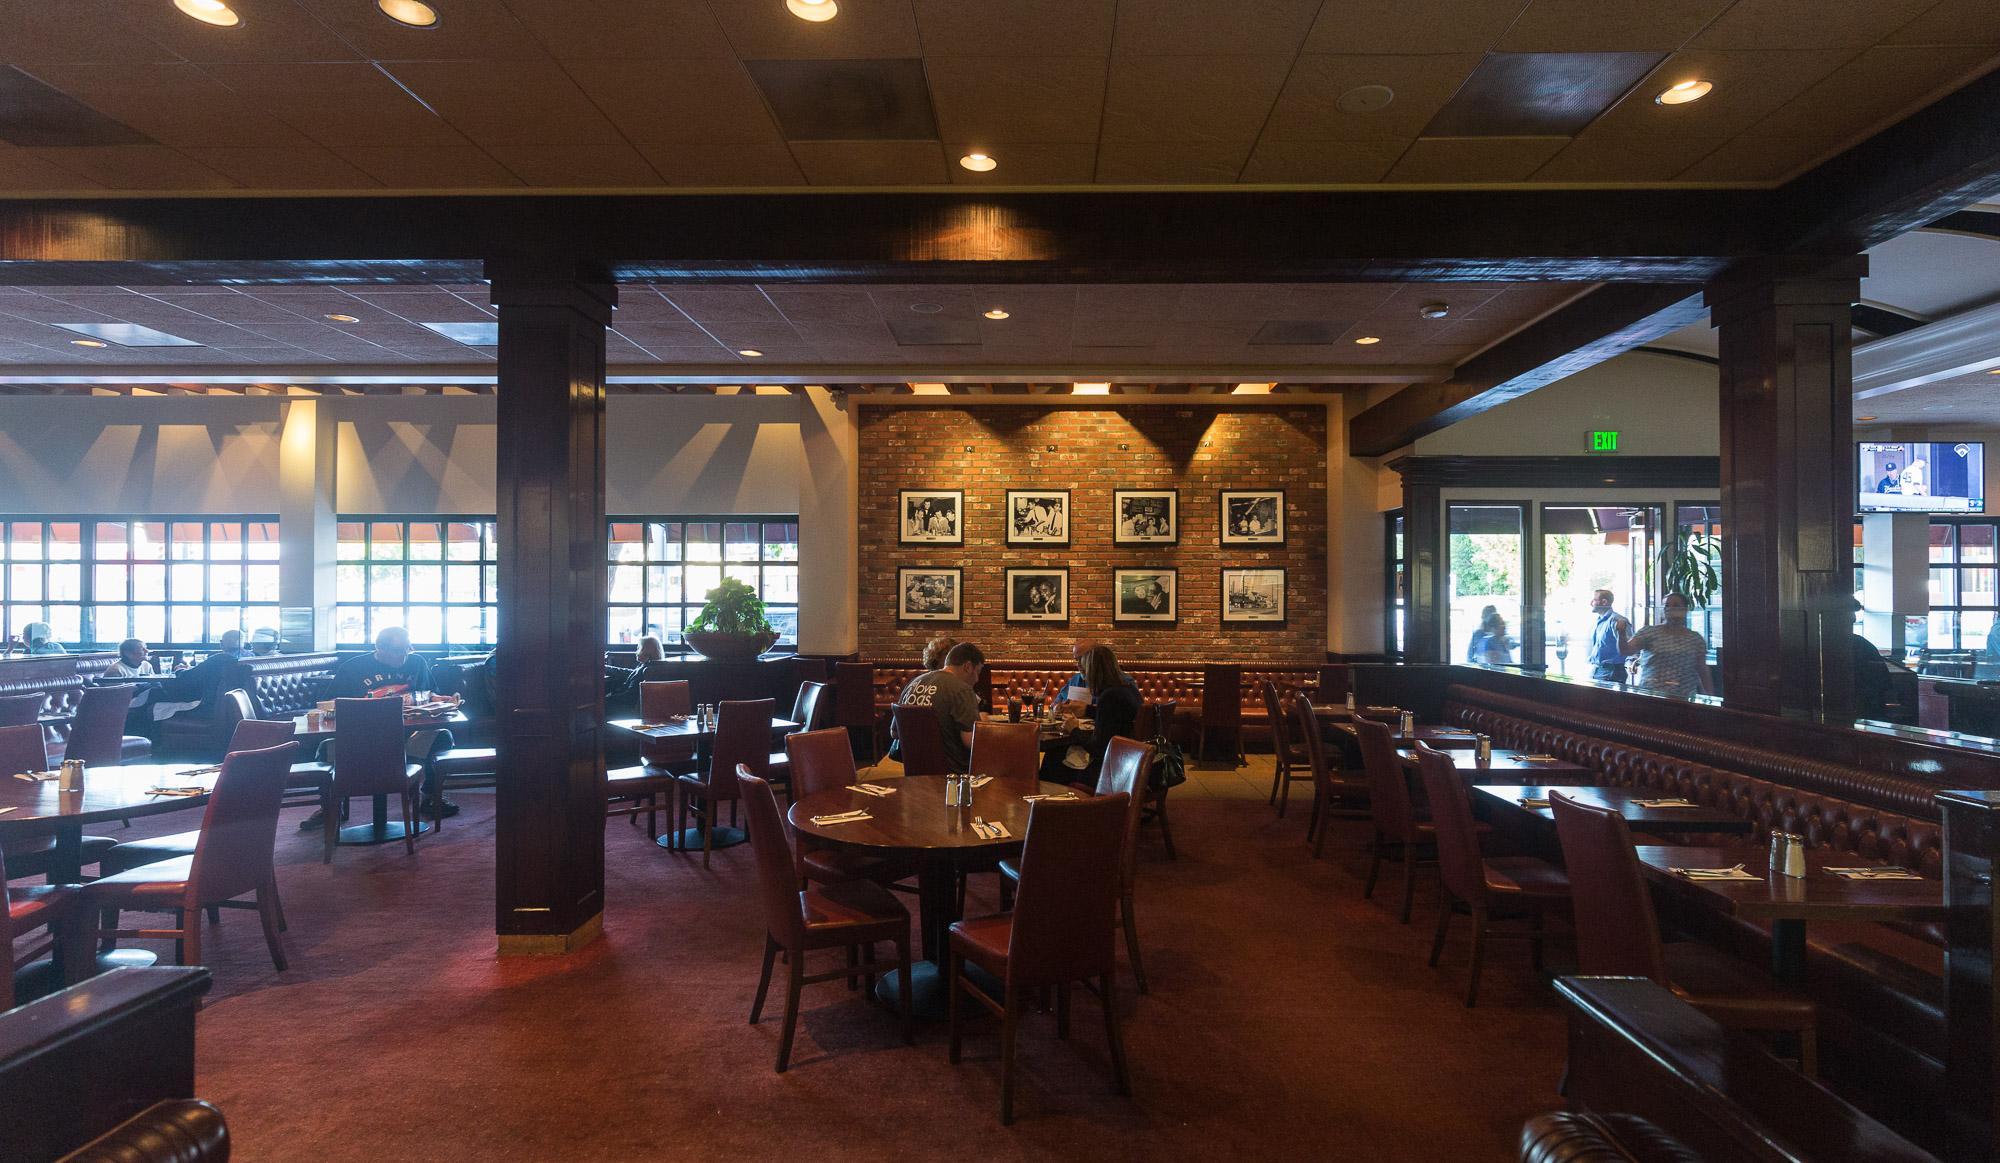 The Last Standing Hamburger Hamlet, Friday 7 p.m. - Eater LA